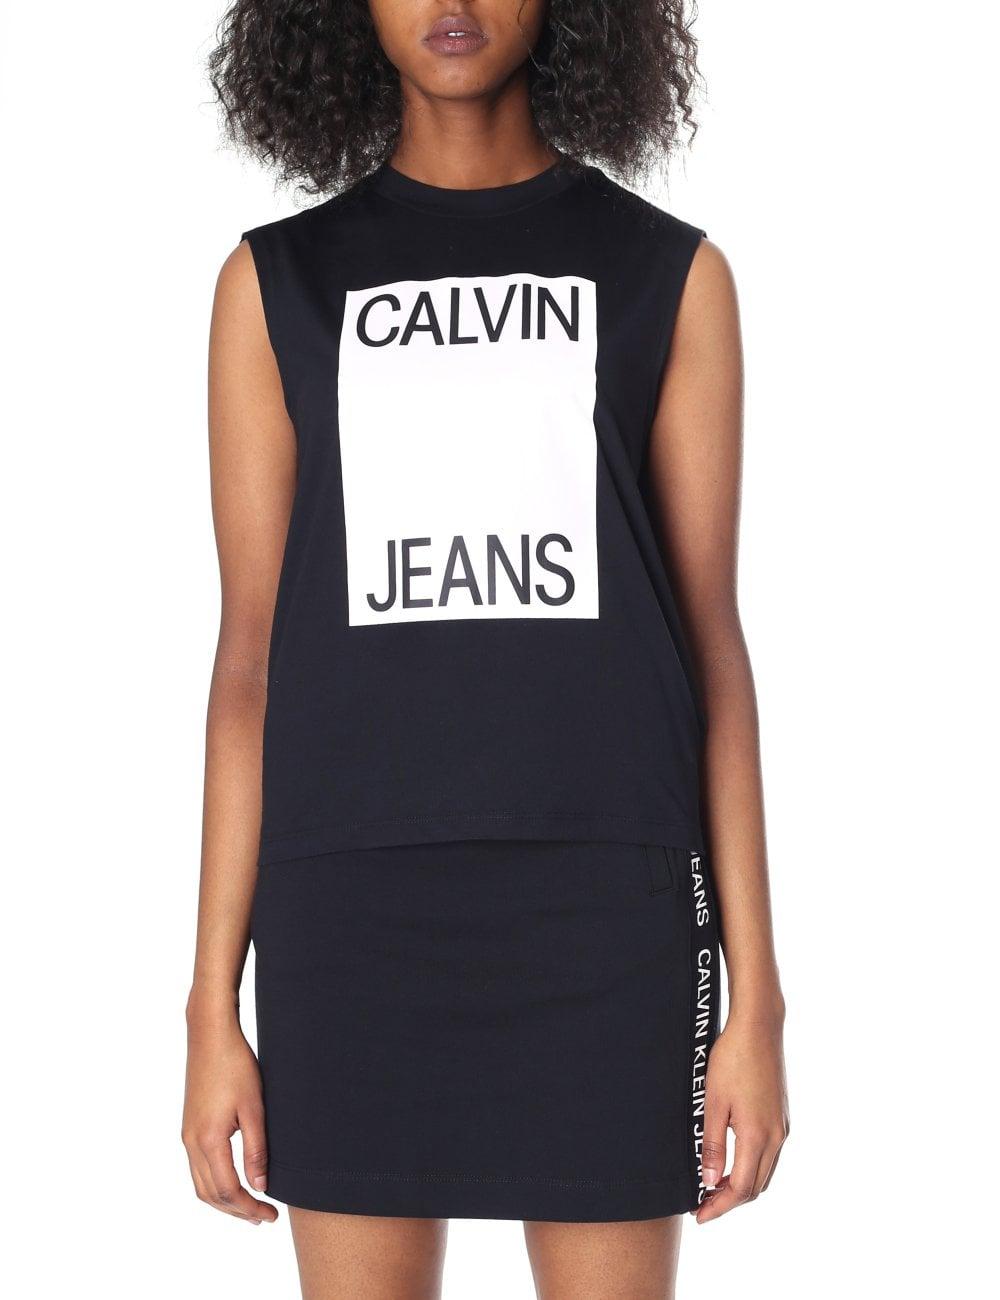 7068c8e3 Calvin Klein Women's Muscle Tank Top